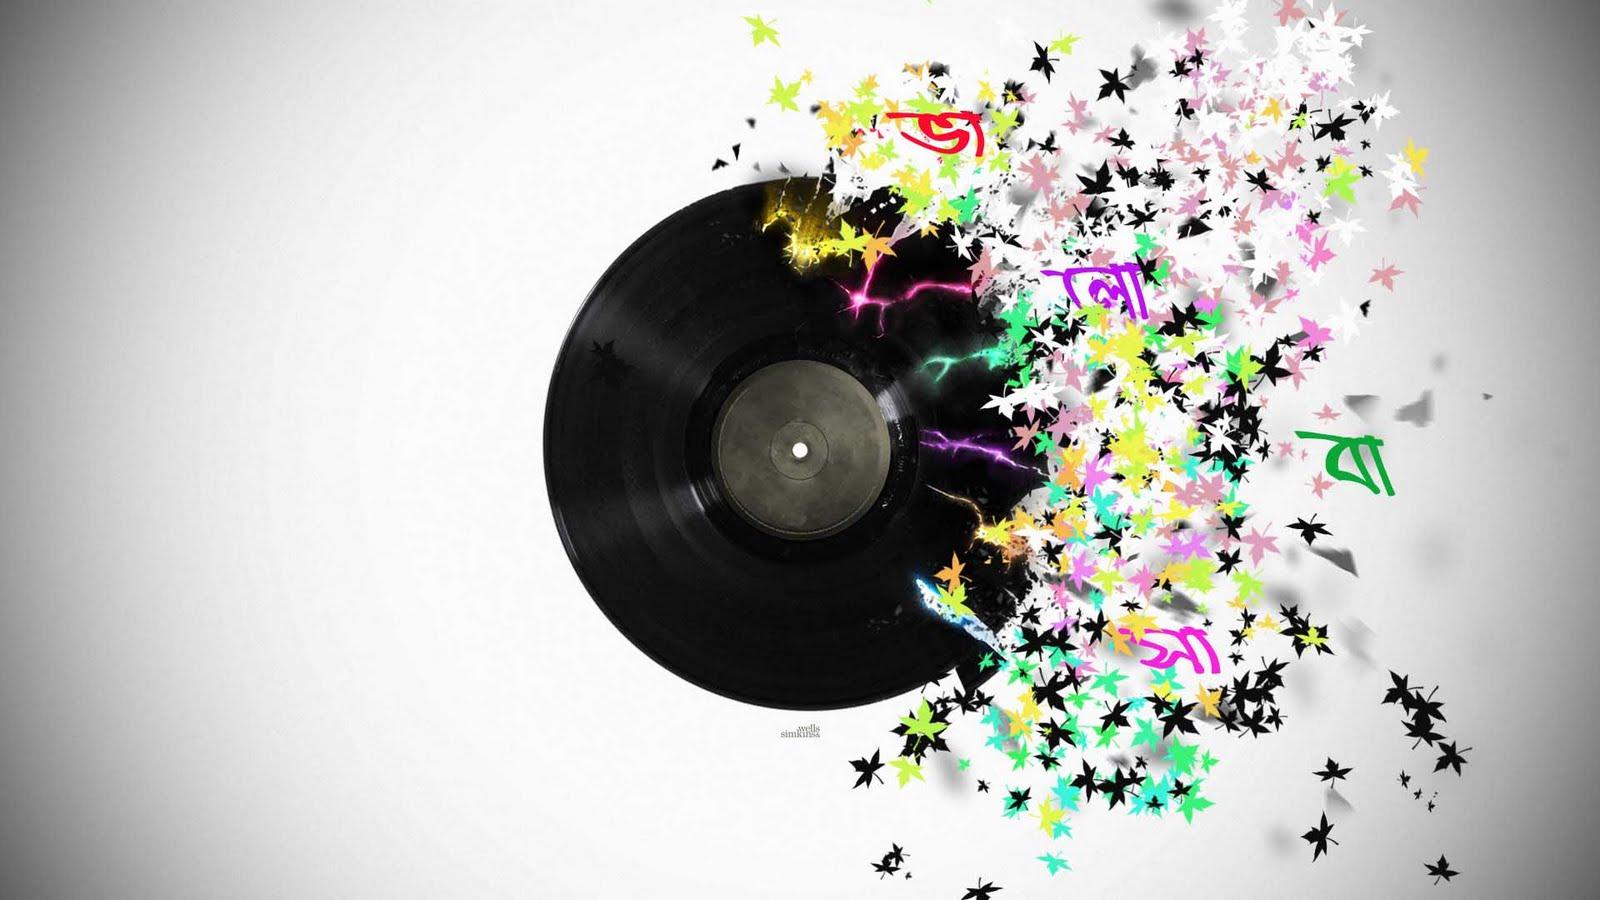 http://3.bp.blogspot.com/_agNyFa6vCGo/TDIma0TrzQI/AAAAAAAAAD8/33giWyzqqgo/s1600/Shattered_Vinyl_HD_Wallpaper_by_Sam_Wells%2Bcopy.jpg